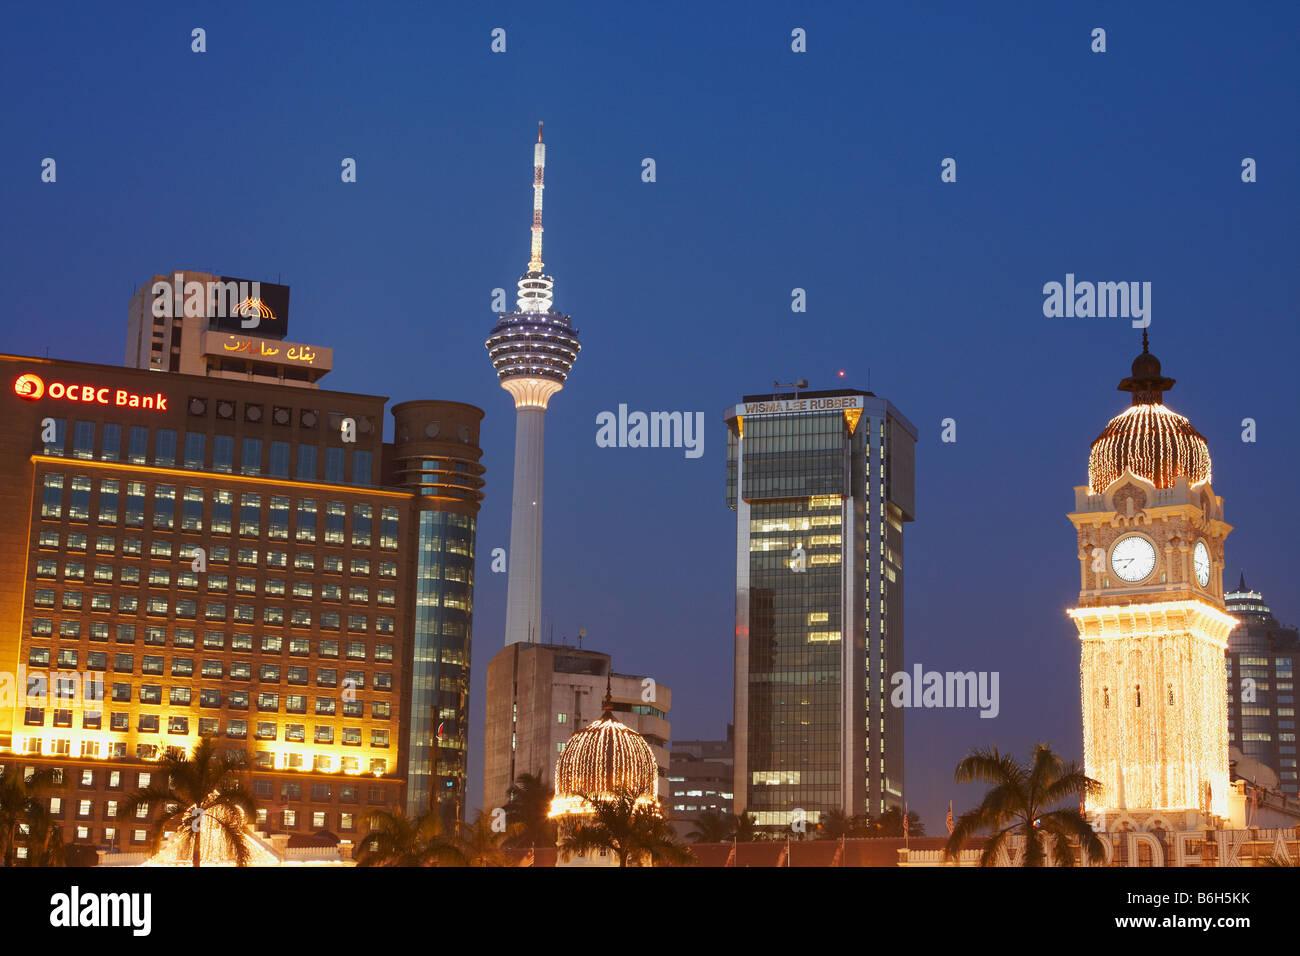 View Of KL Tower From Merdeka Square At Dusk, Kuala Lumpur - Stock Image